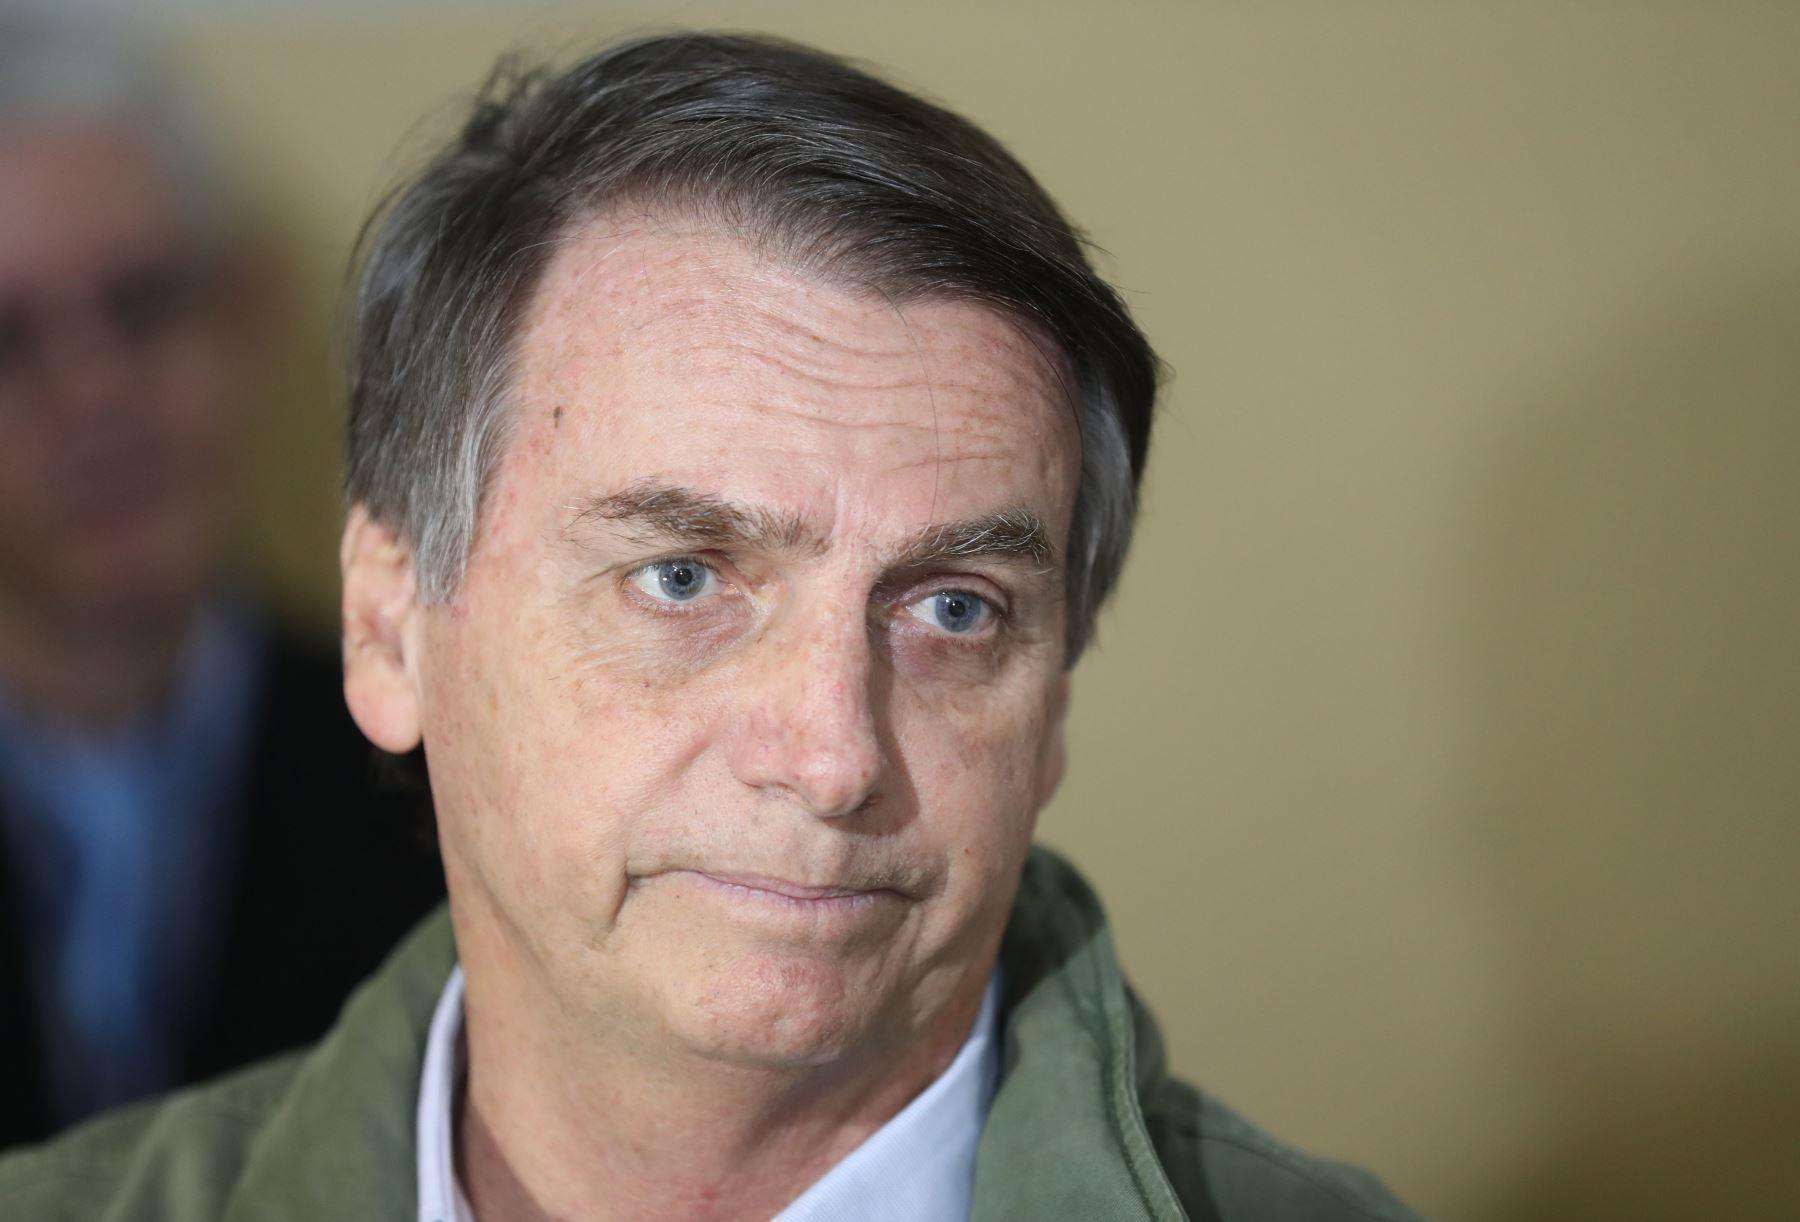 Jair Bolsonaro, presidente de Brasil, en imagen de archivo. Foto: AFP